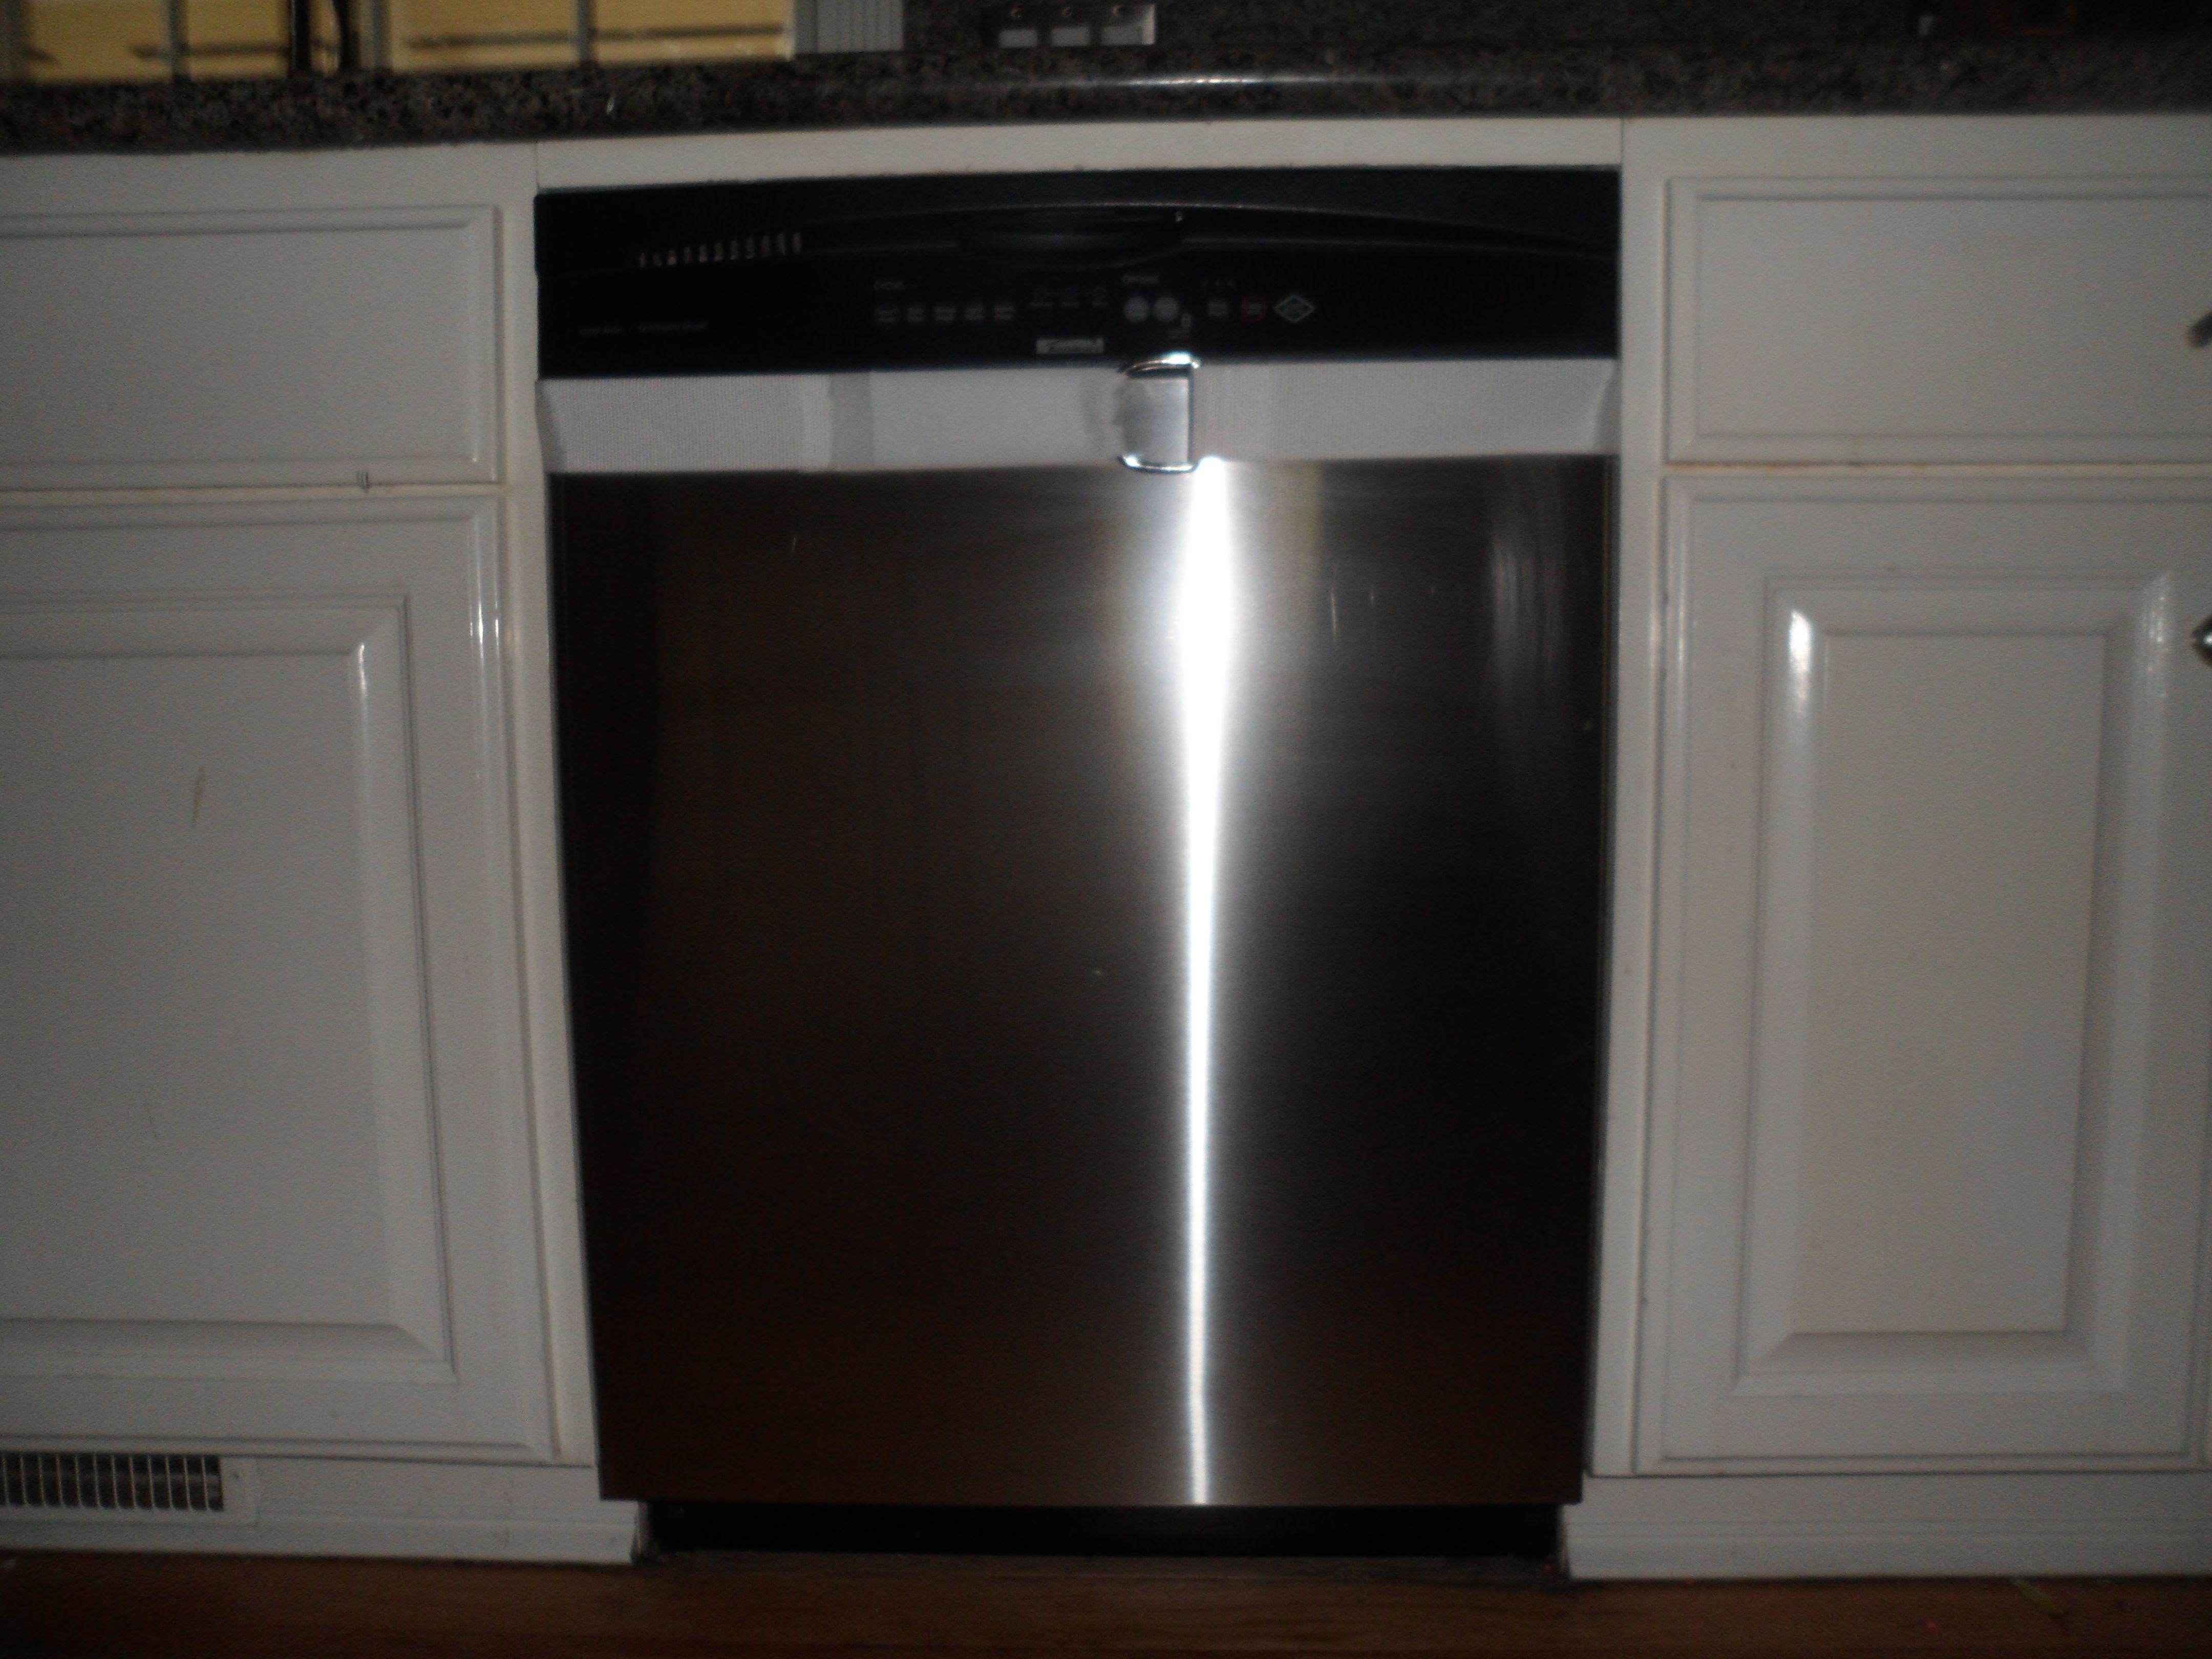 kitchenaid bottom freezer handle loose